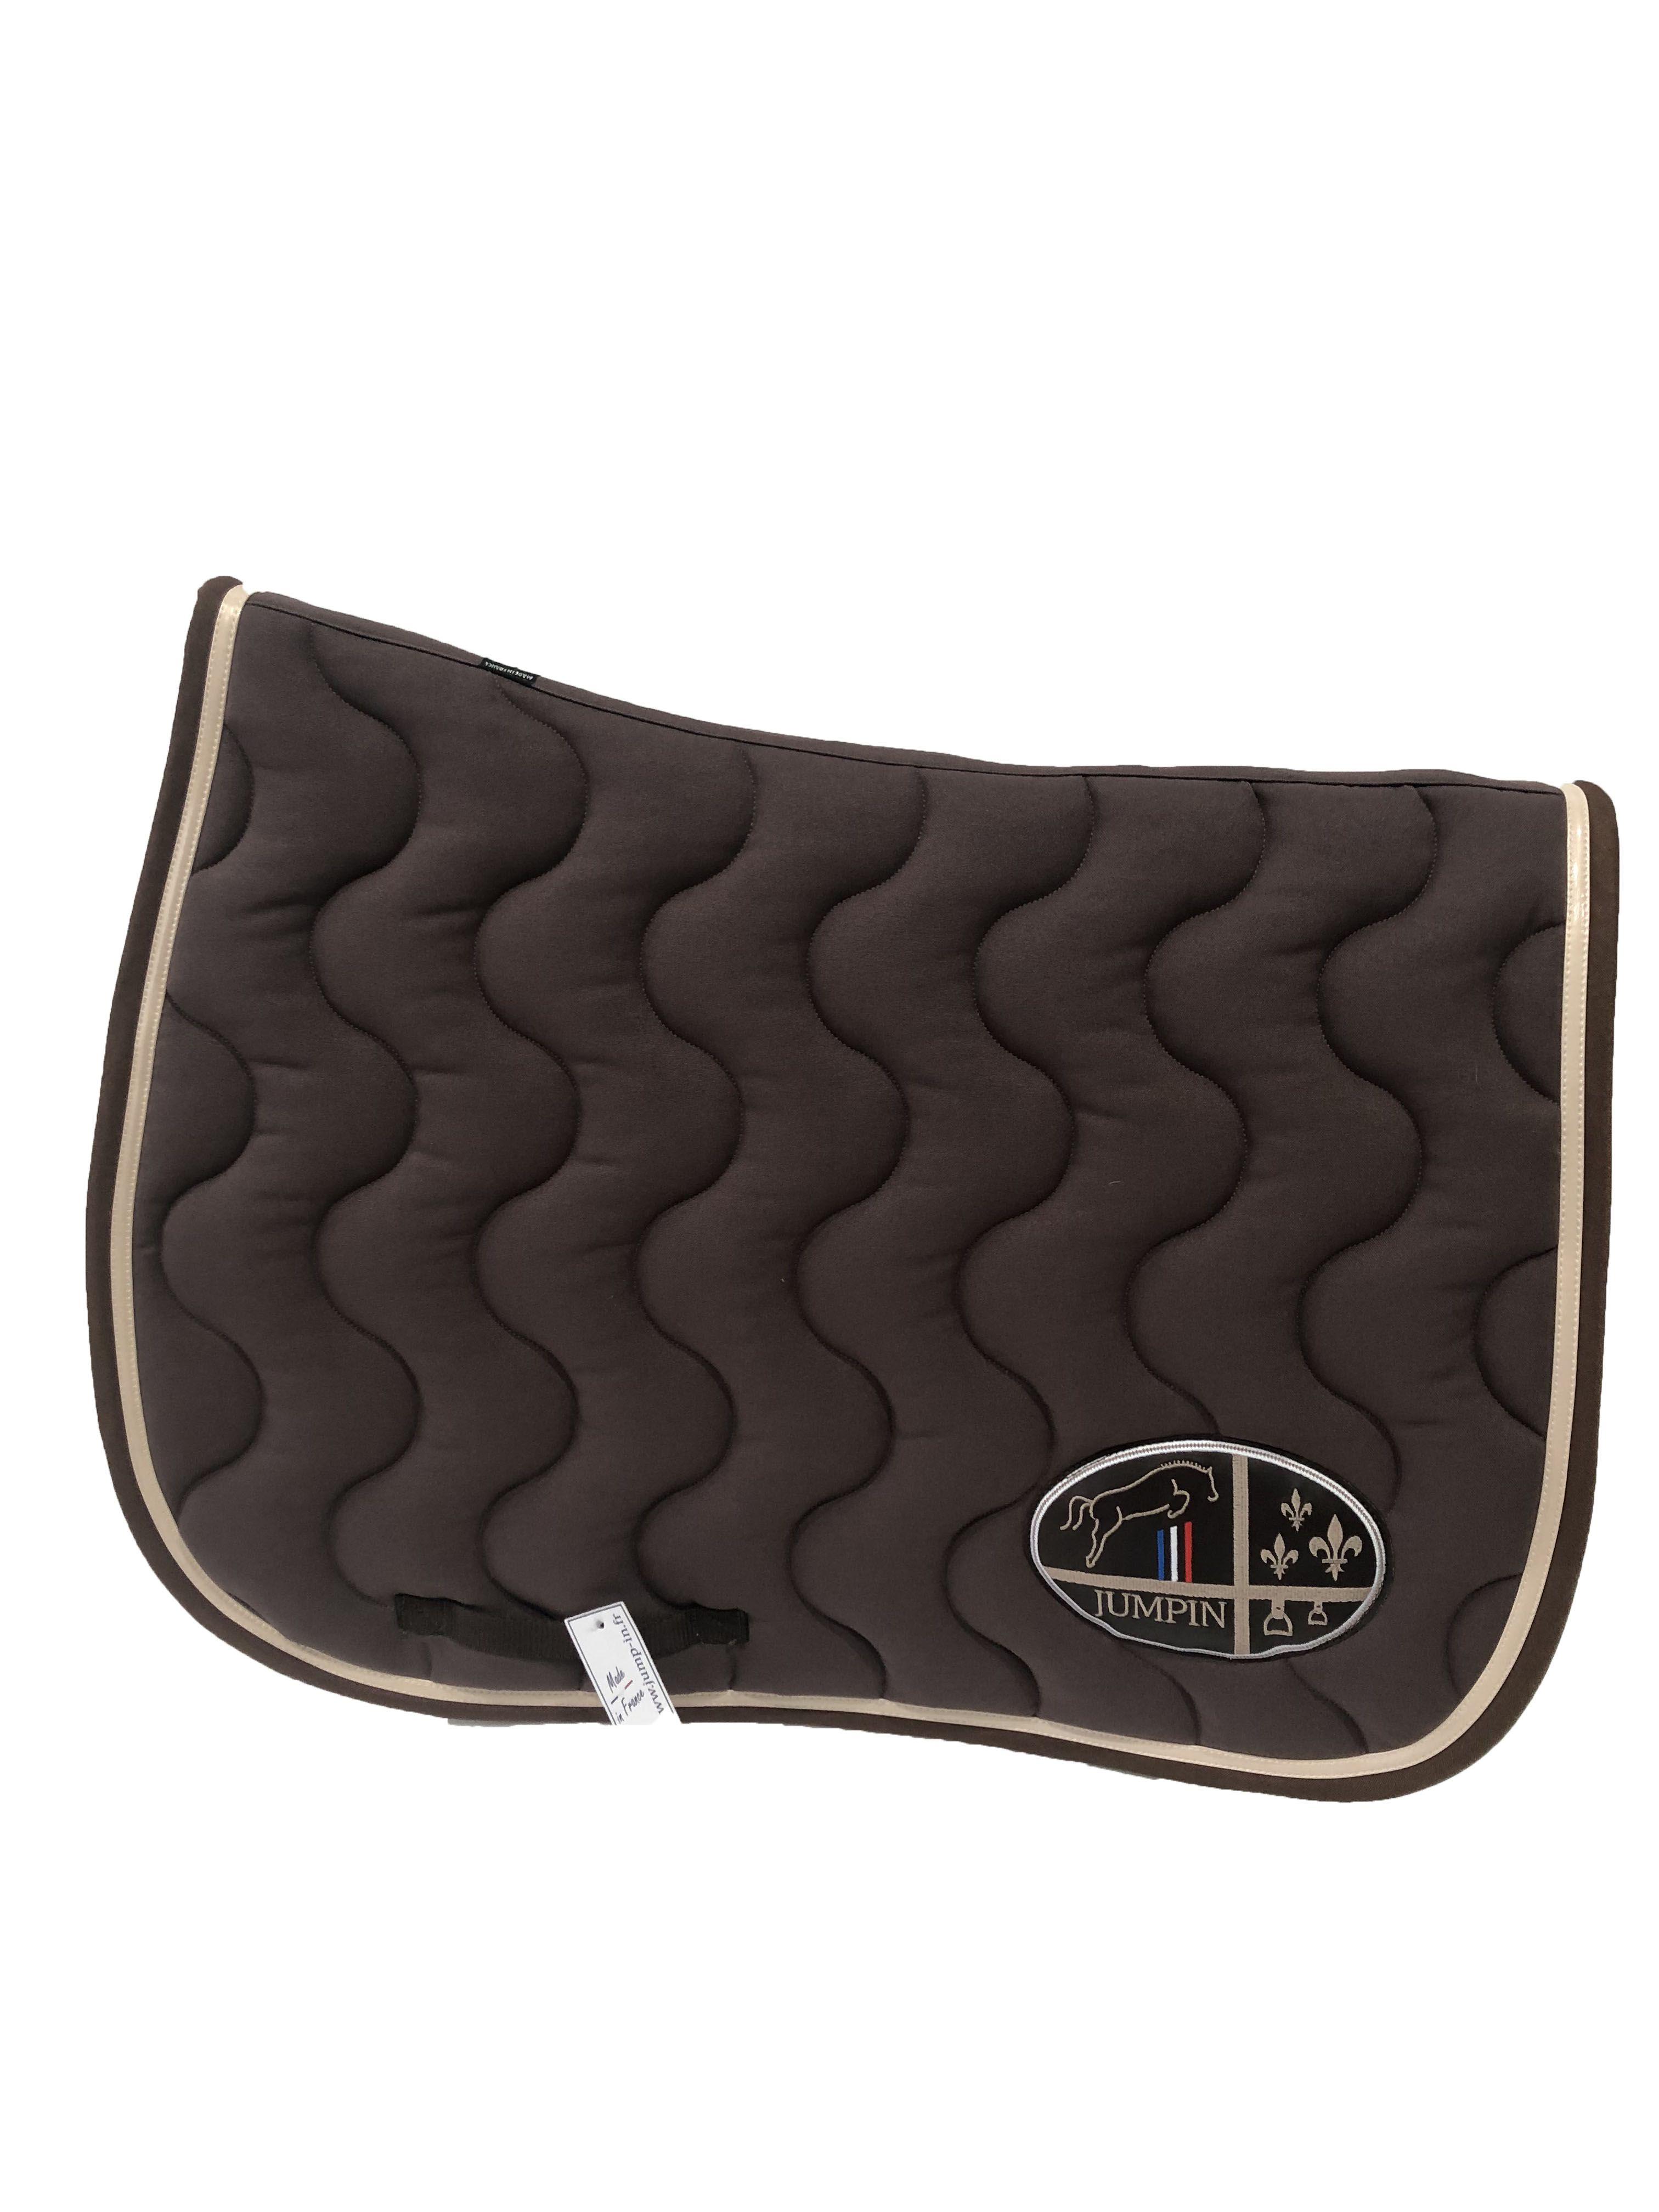 tapis de selle marron creme choco jump in boutique equitation